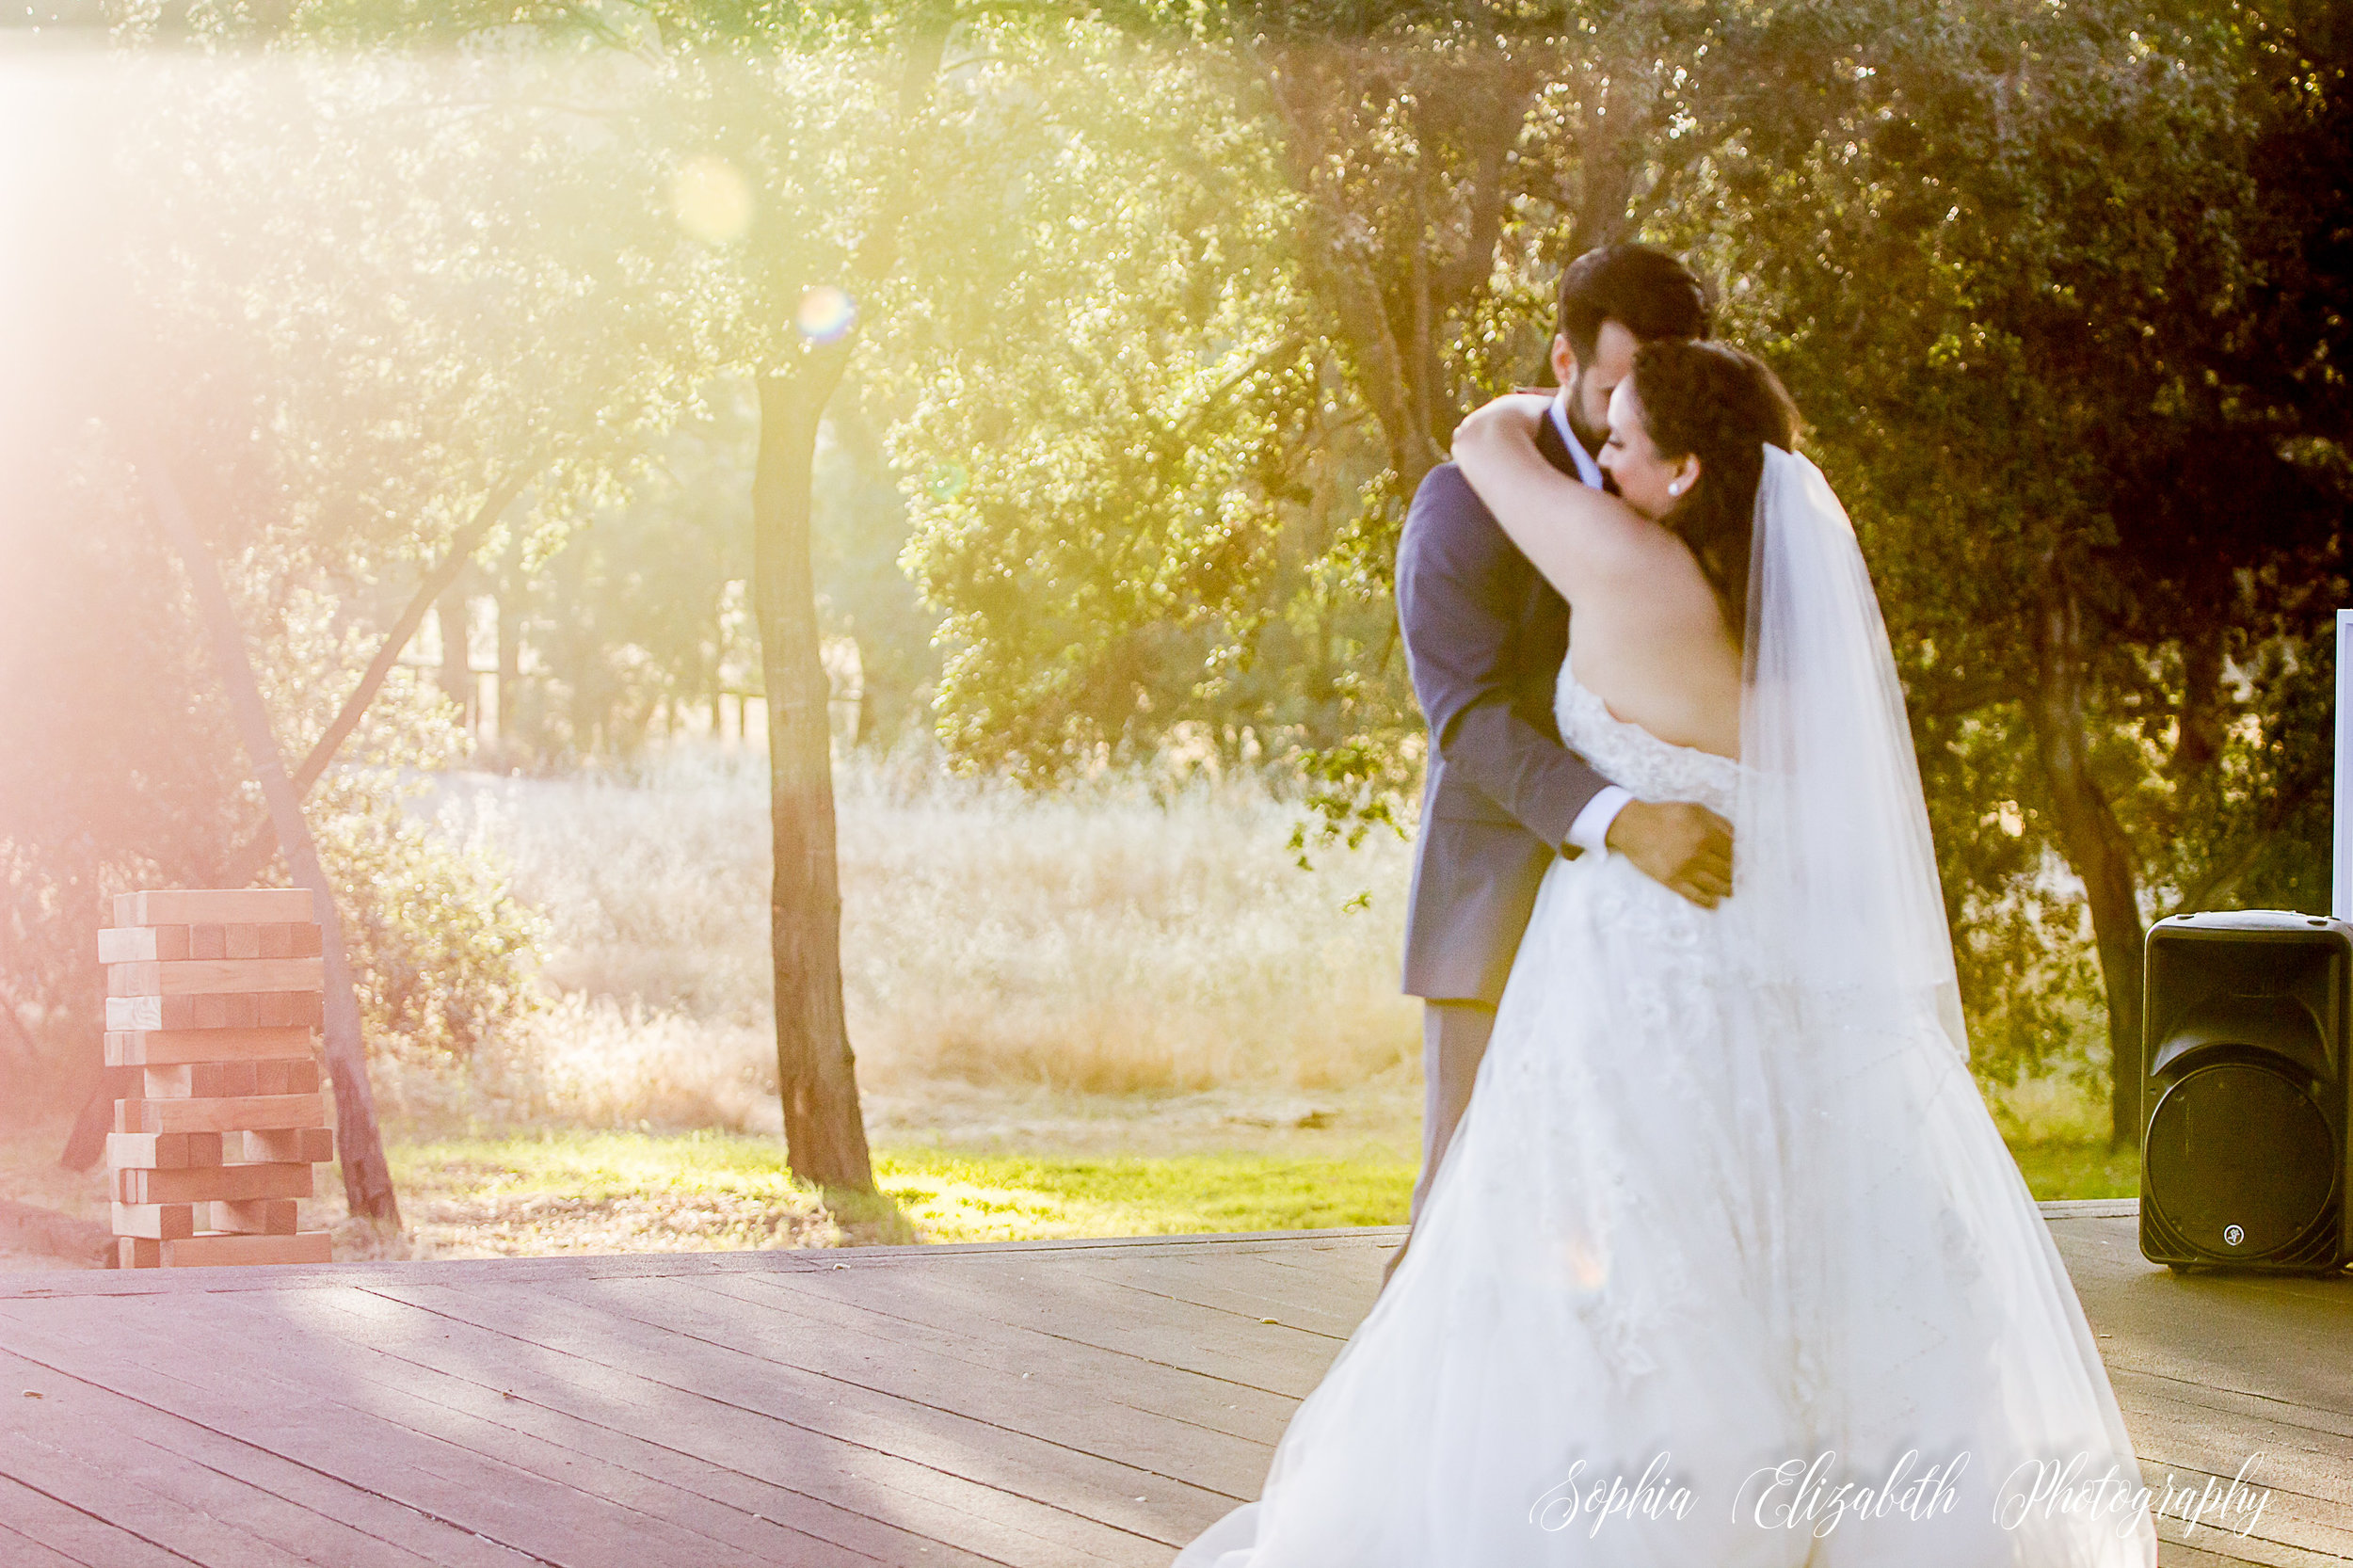 big-oaks-ranch-wedding-san-diego-california-wedding-photographer- (2 of 5).jpg